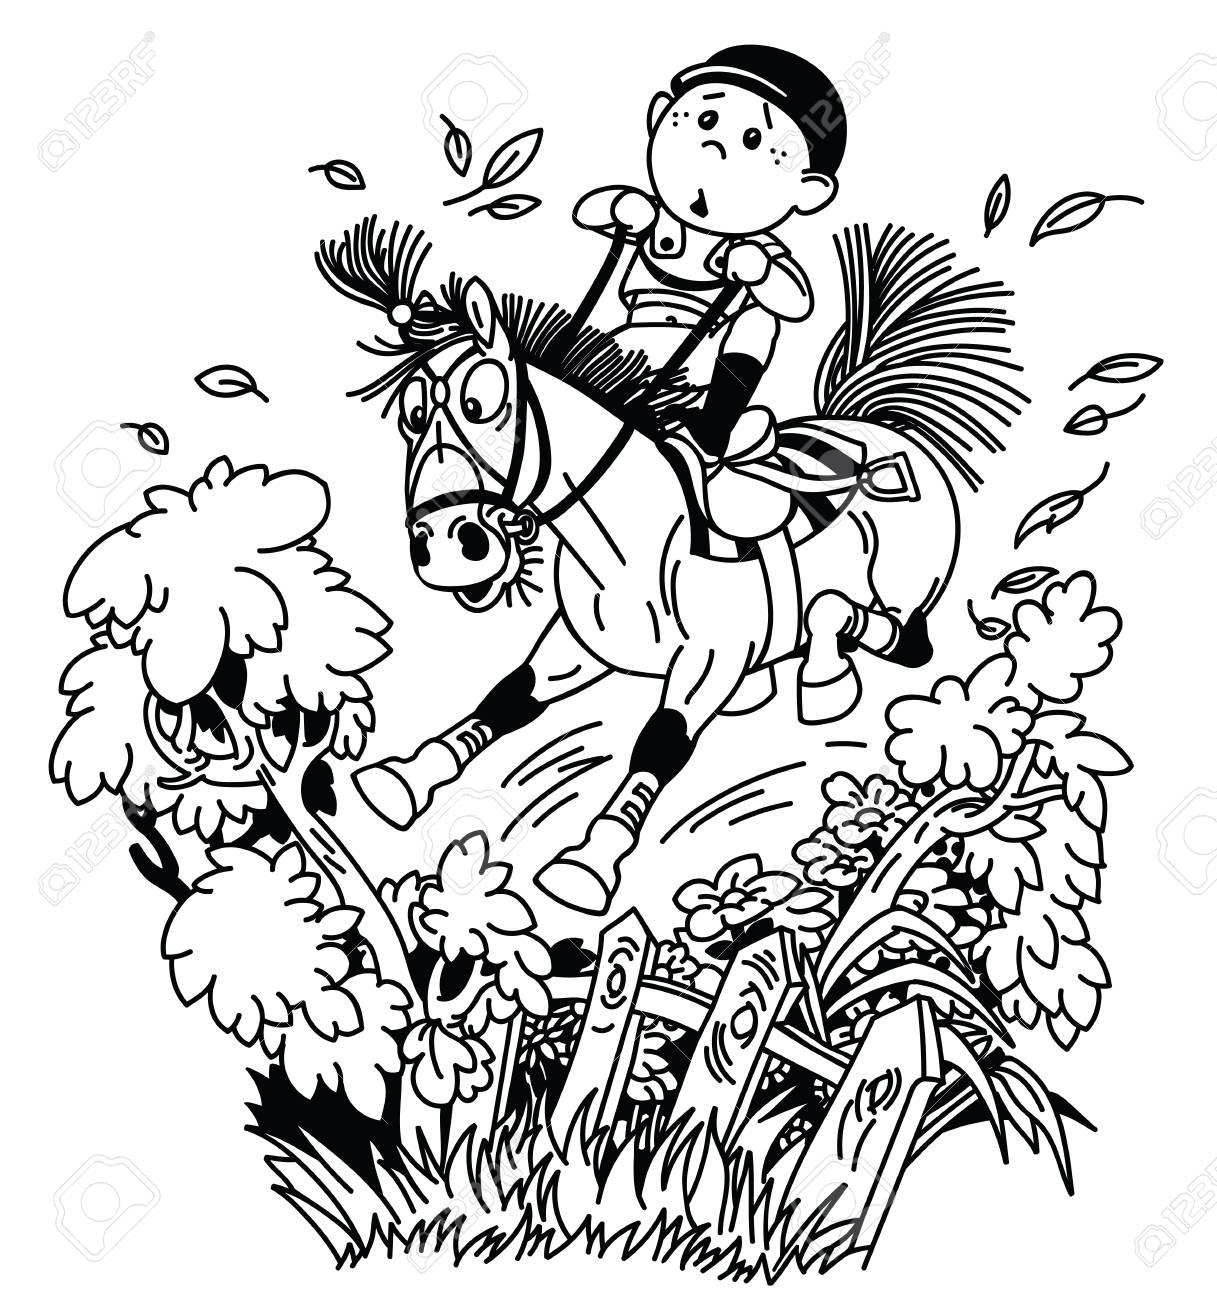 Cartoon Kid Jockey Riding His Pony Horse And Training To Jump Royalty Free Cliparts Vectors And Stock Illustration Image 116481034